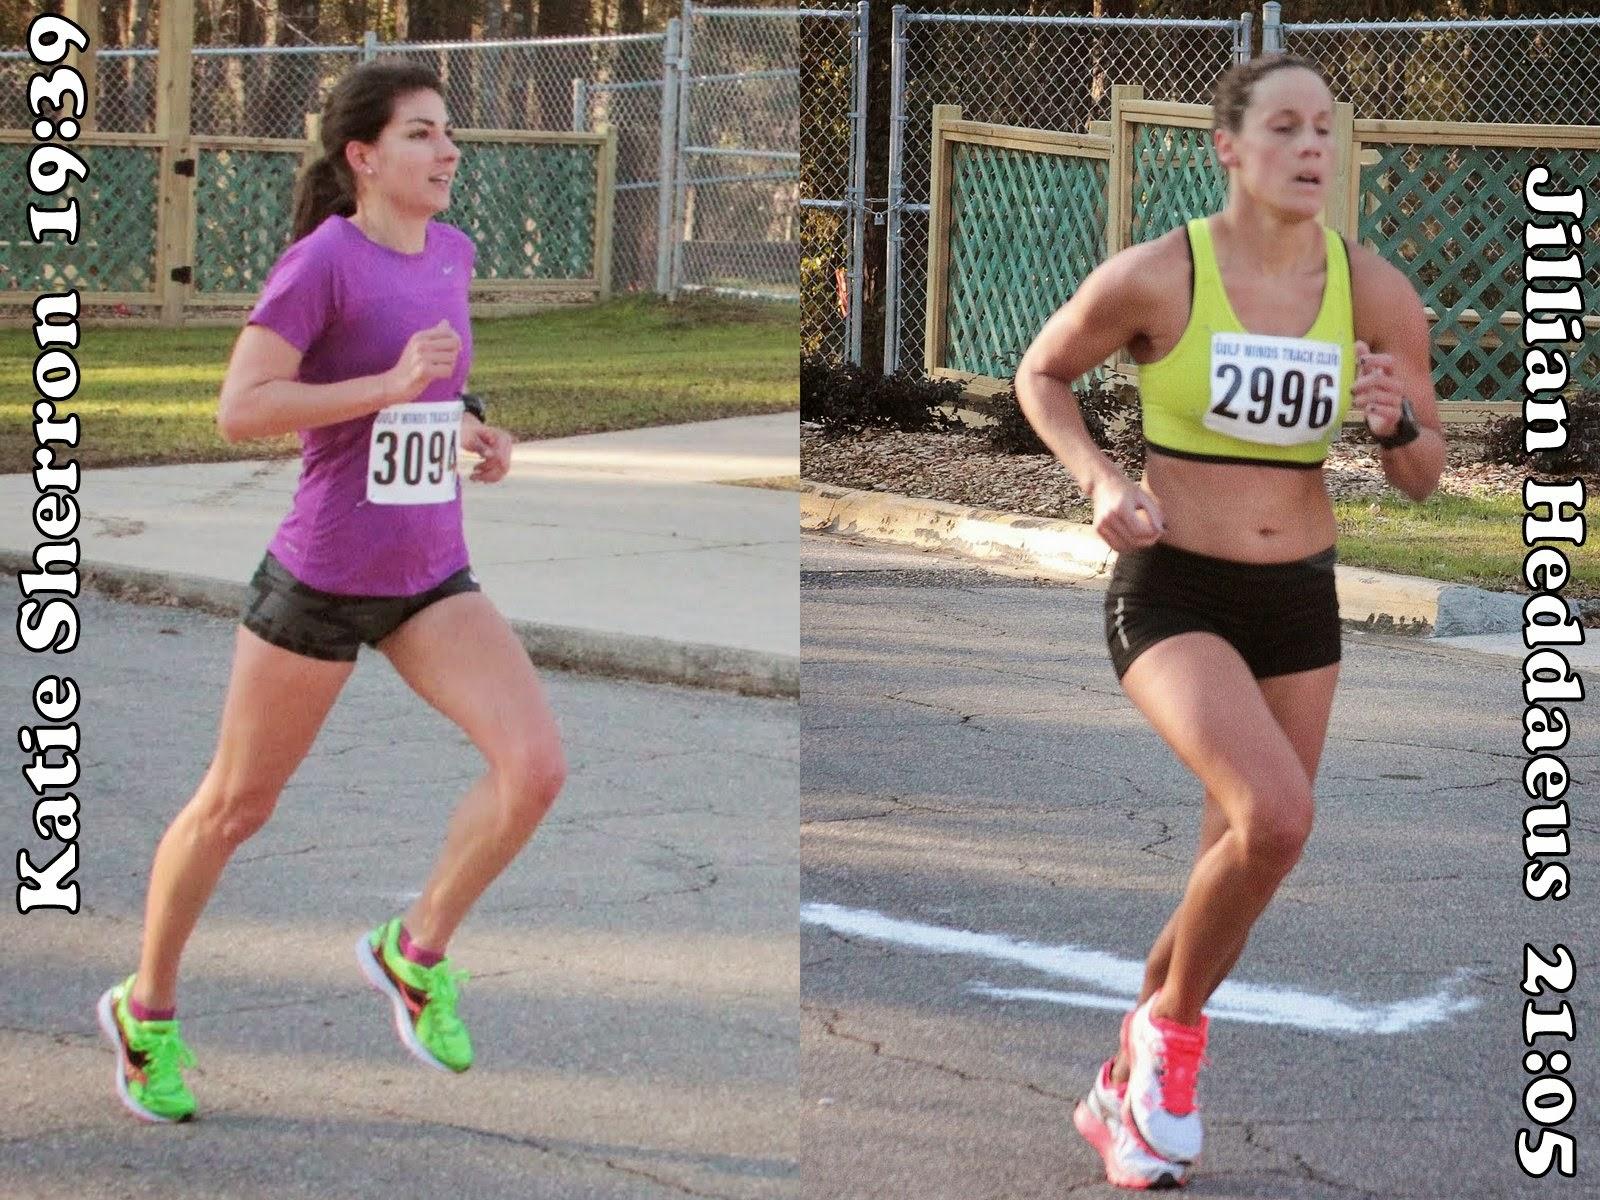 Katie Sherron and Jillian Heddaeus